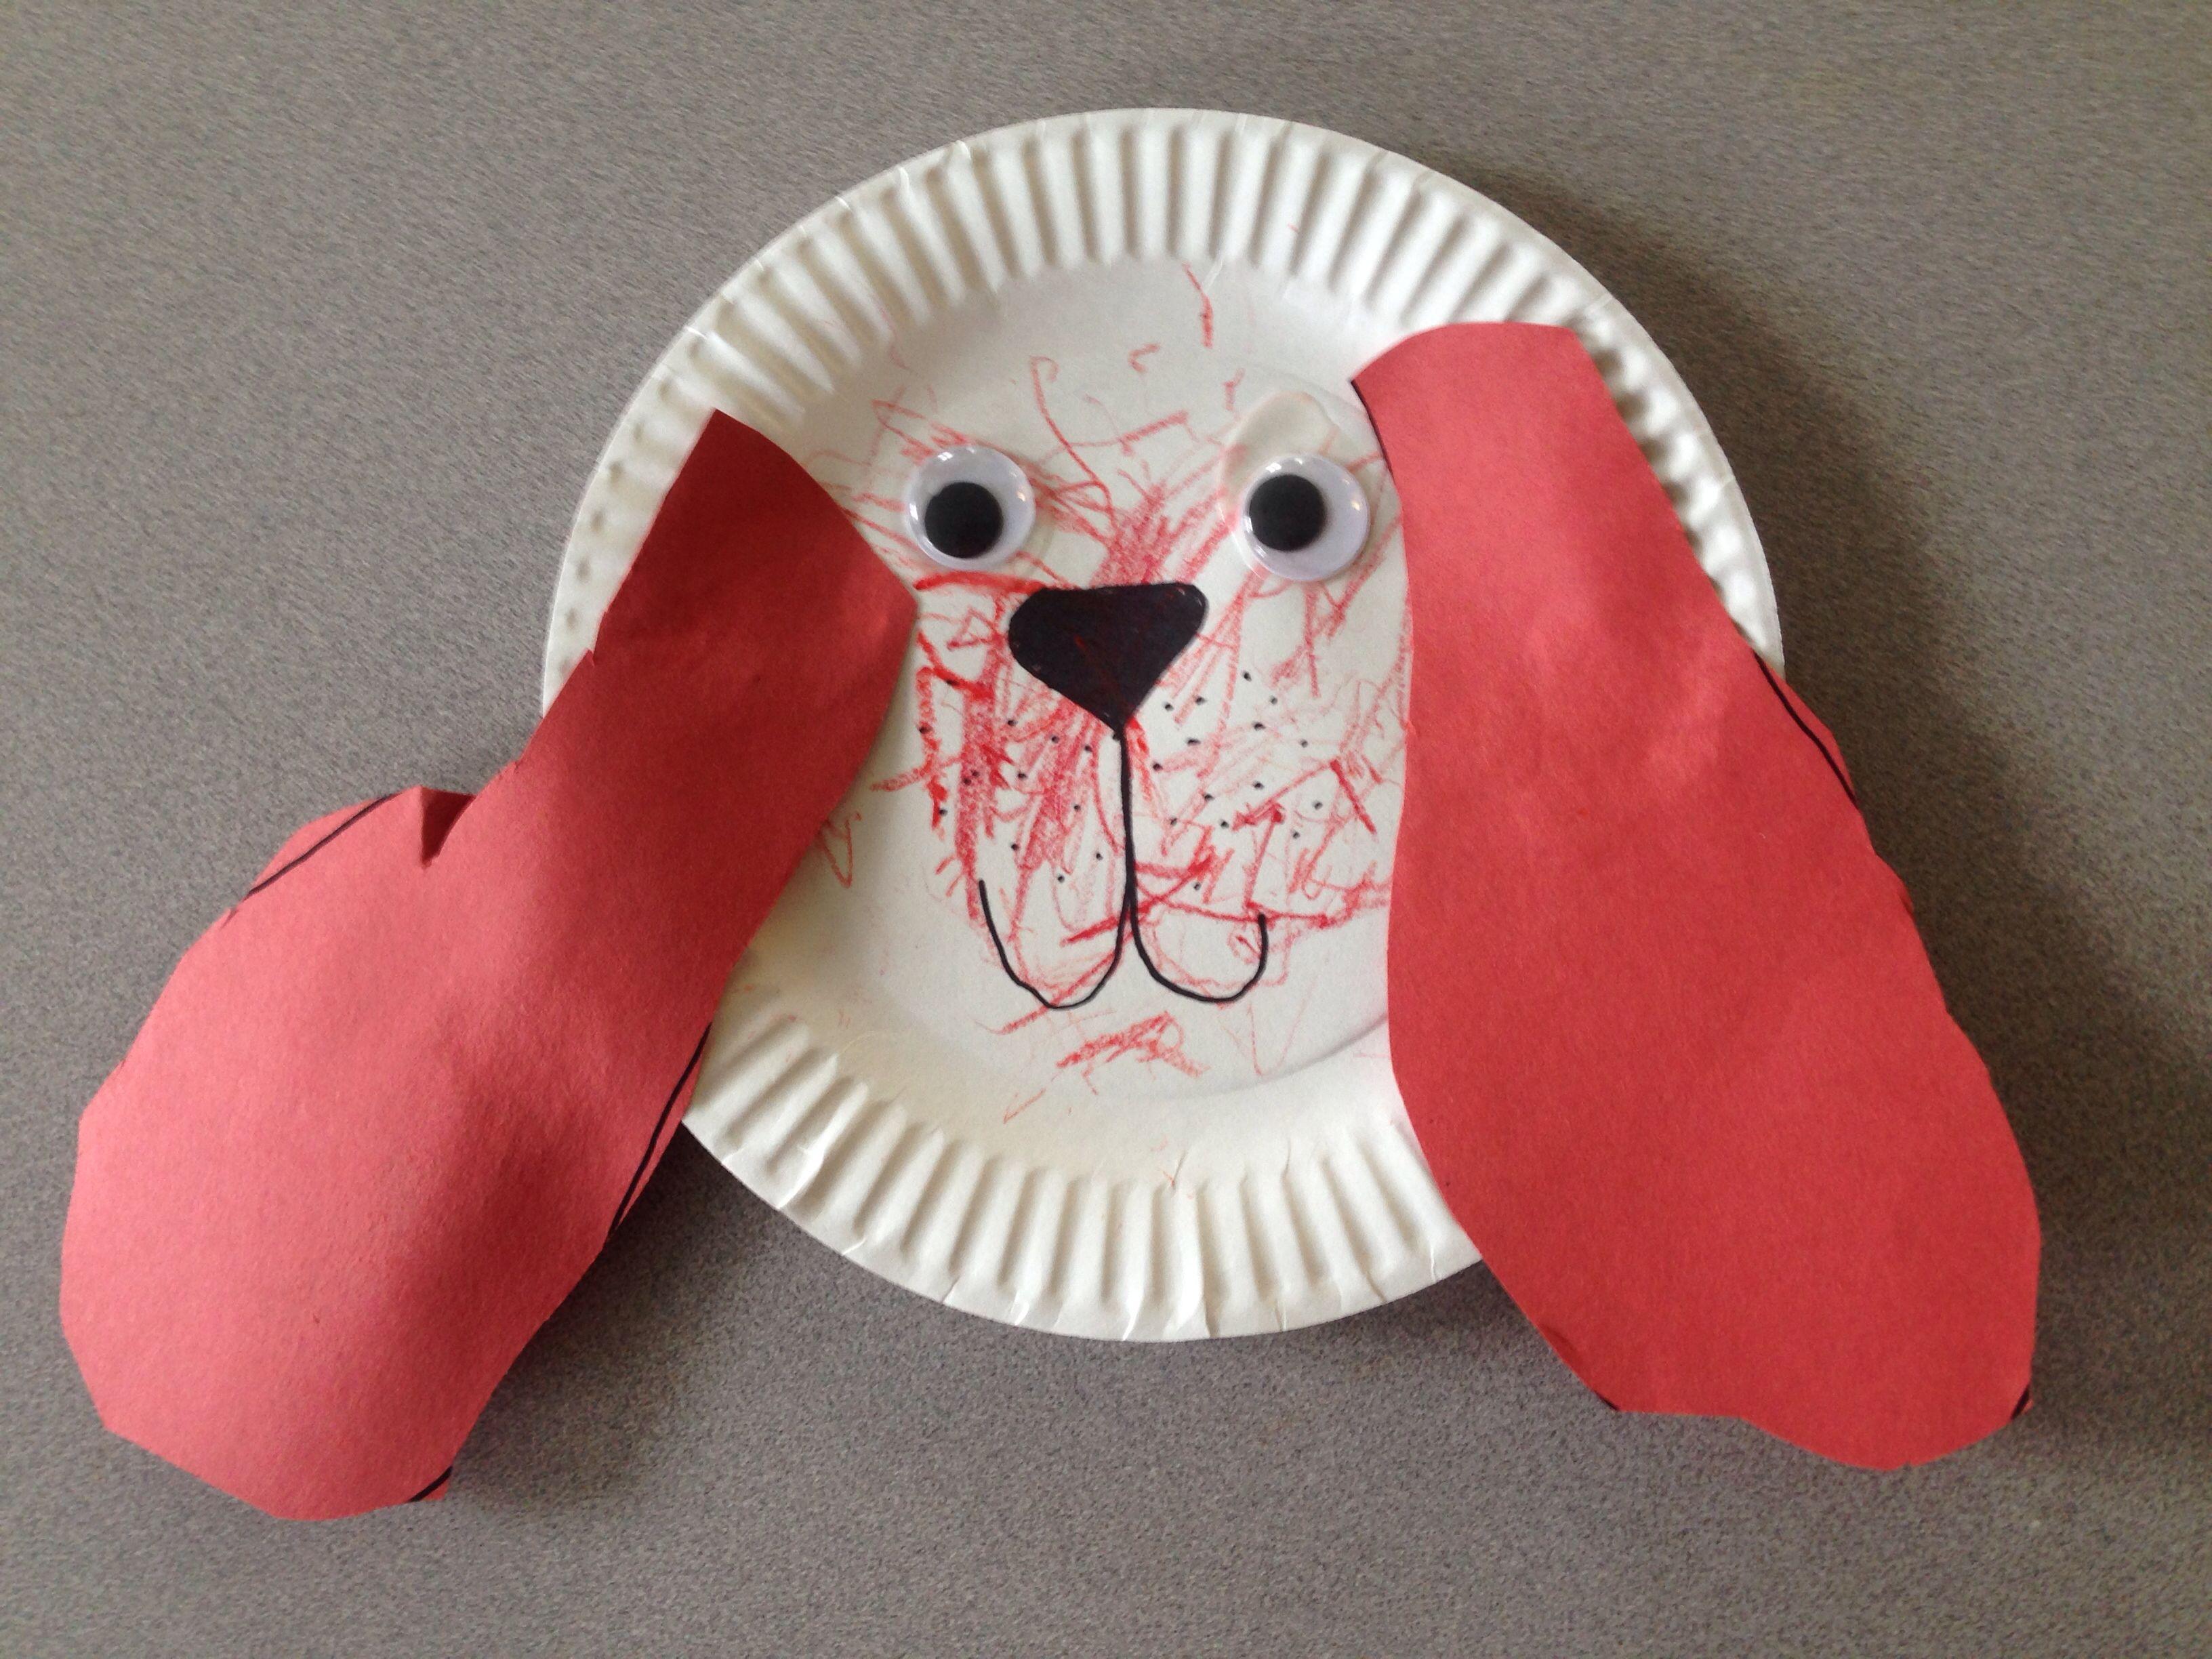 Clifford Big Red Dog Crafts Preschool Art Activities